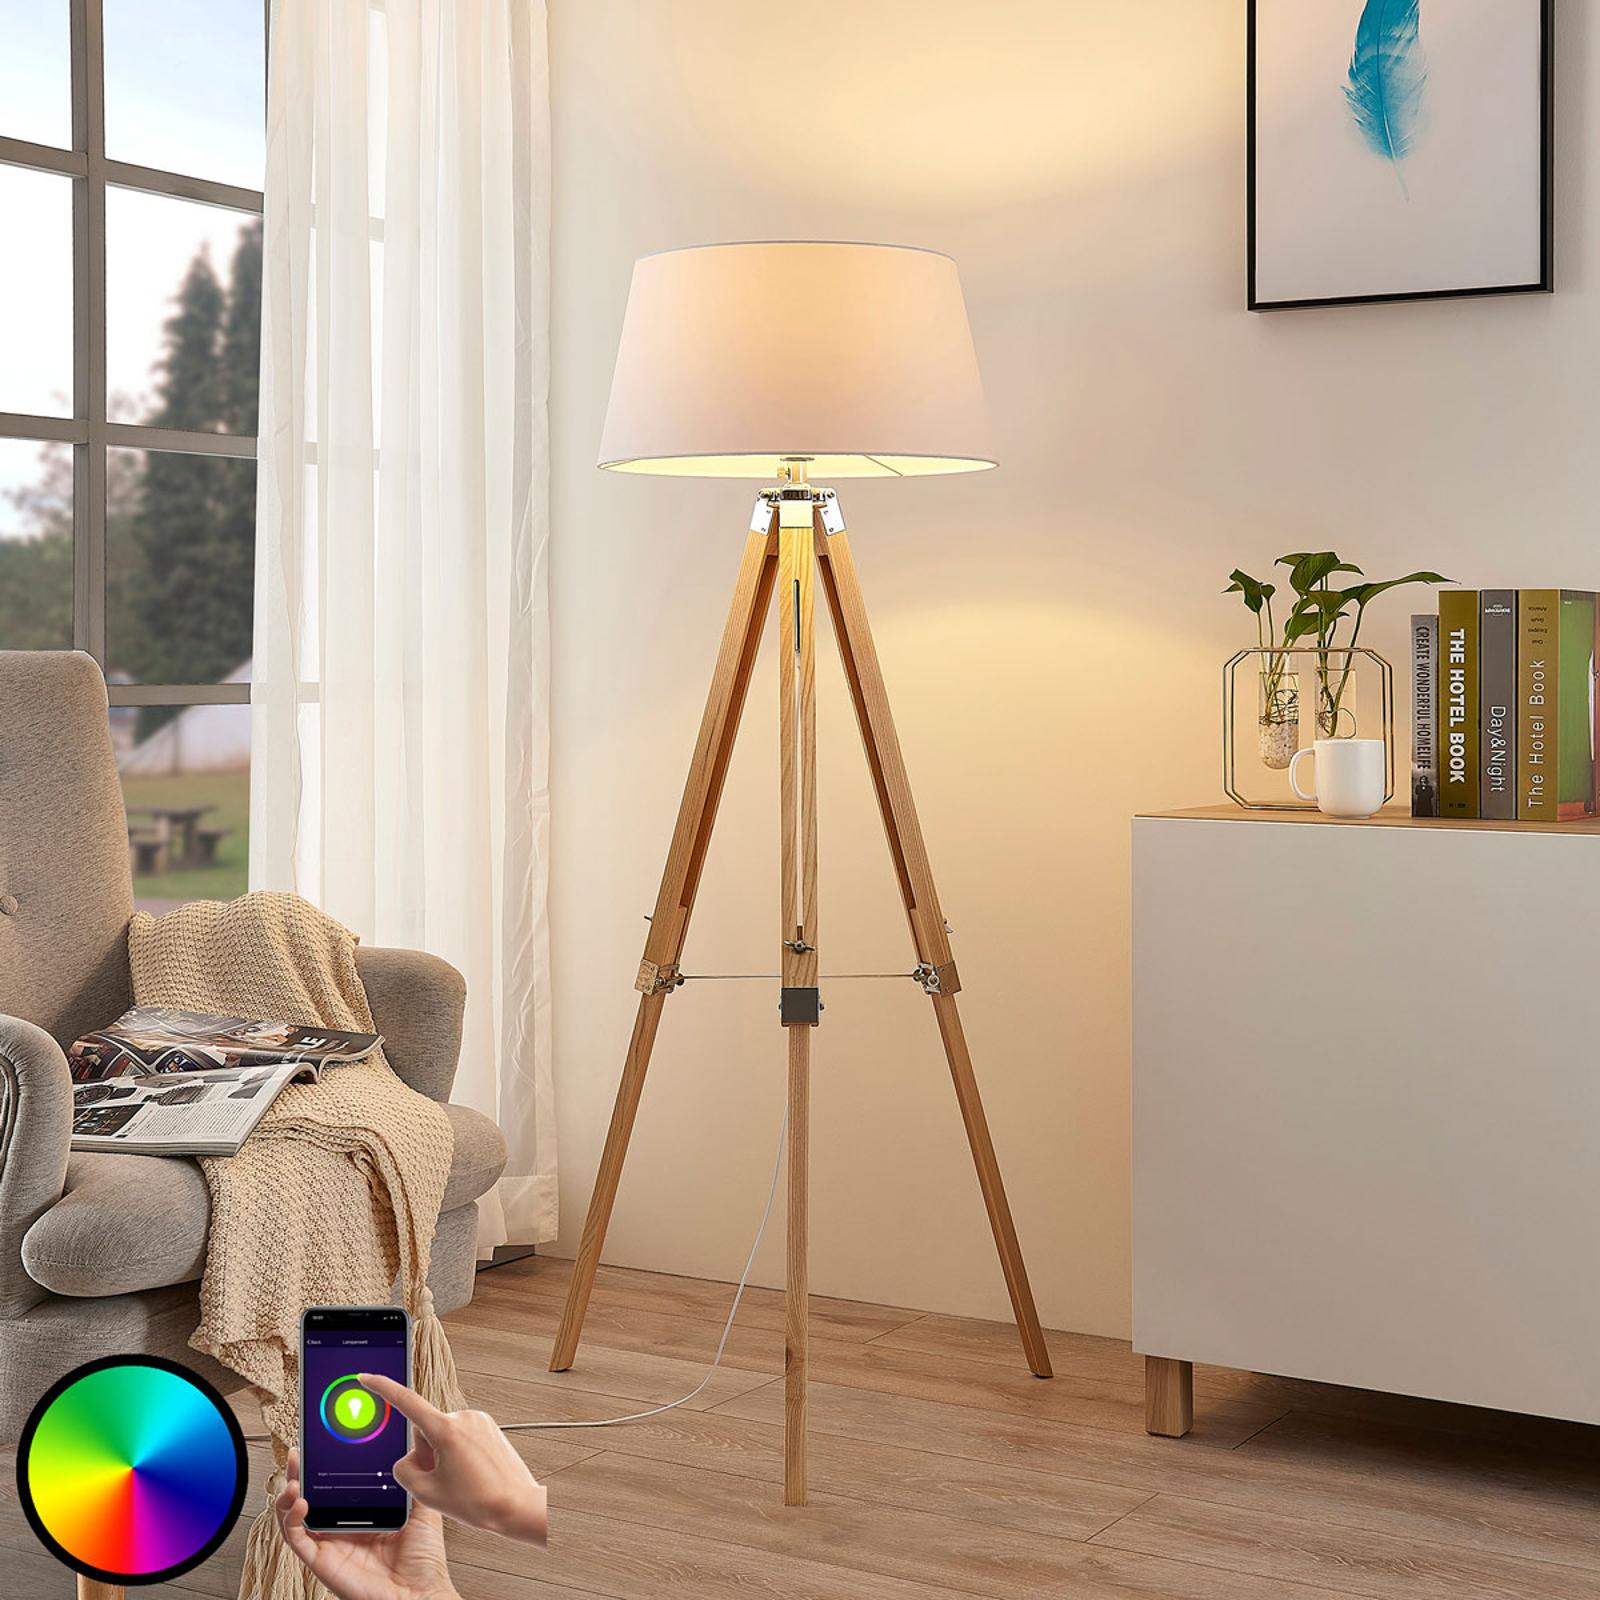 Lindy Smart LED-gulvlampe Alessa, tripod, app, RGB